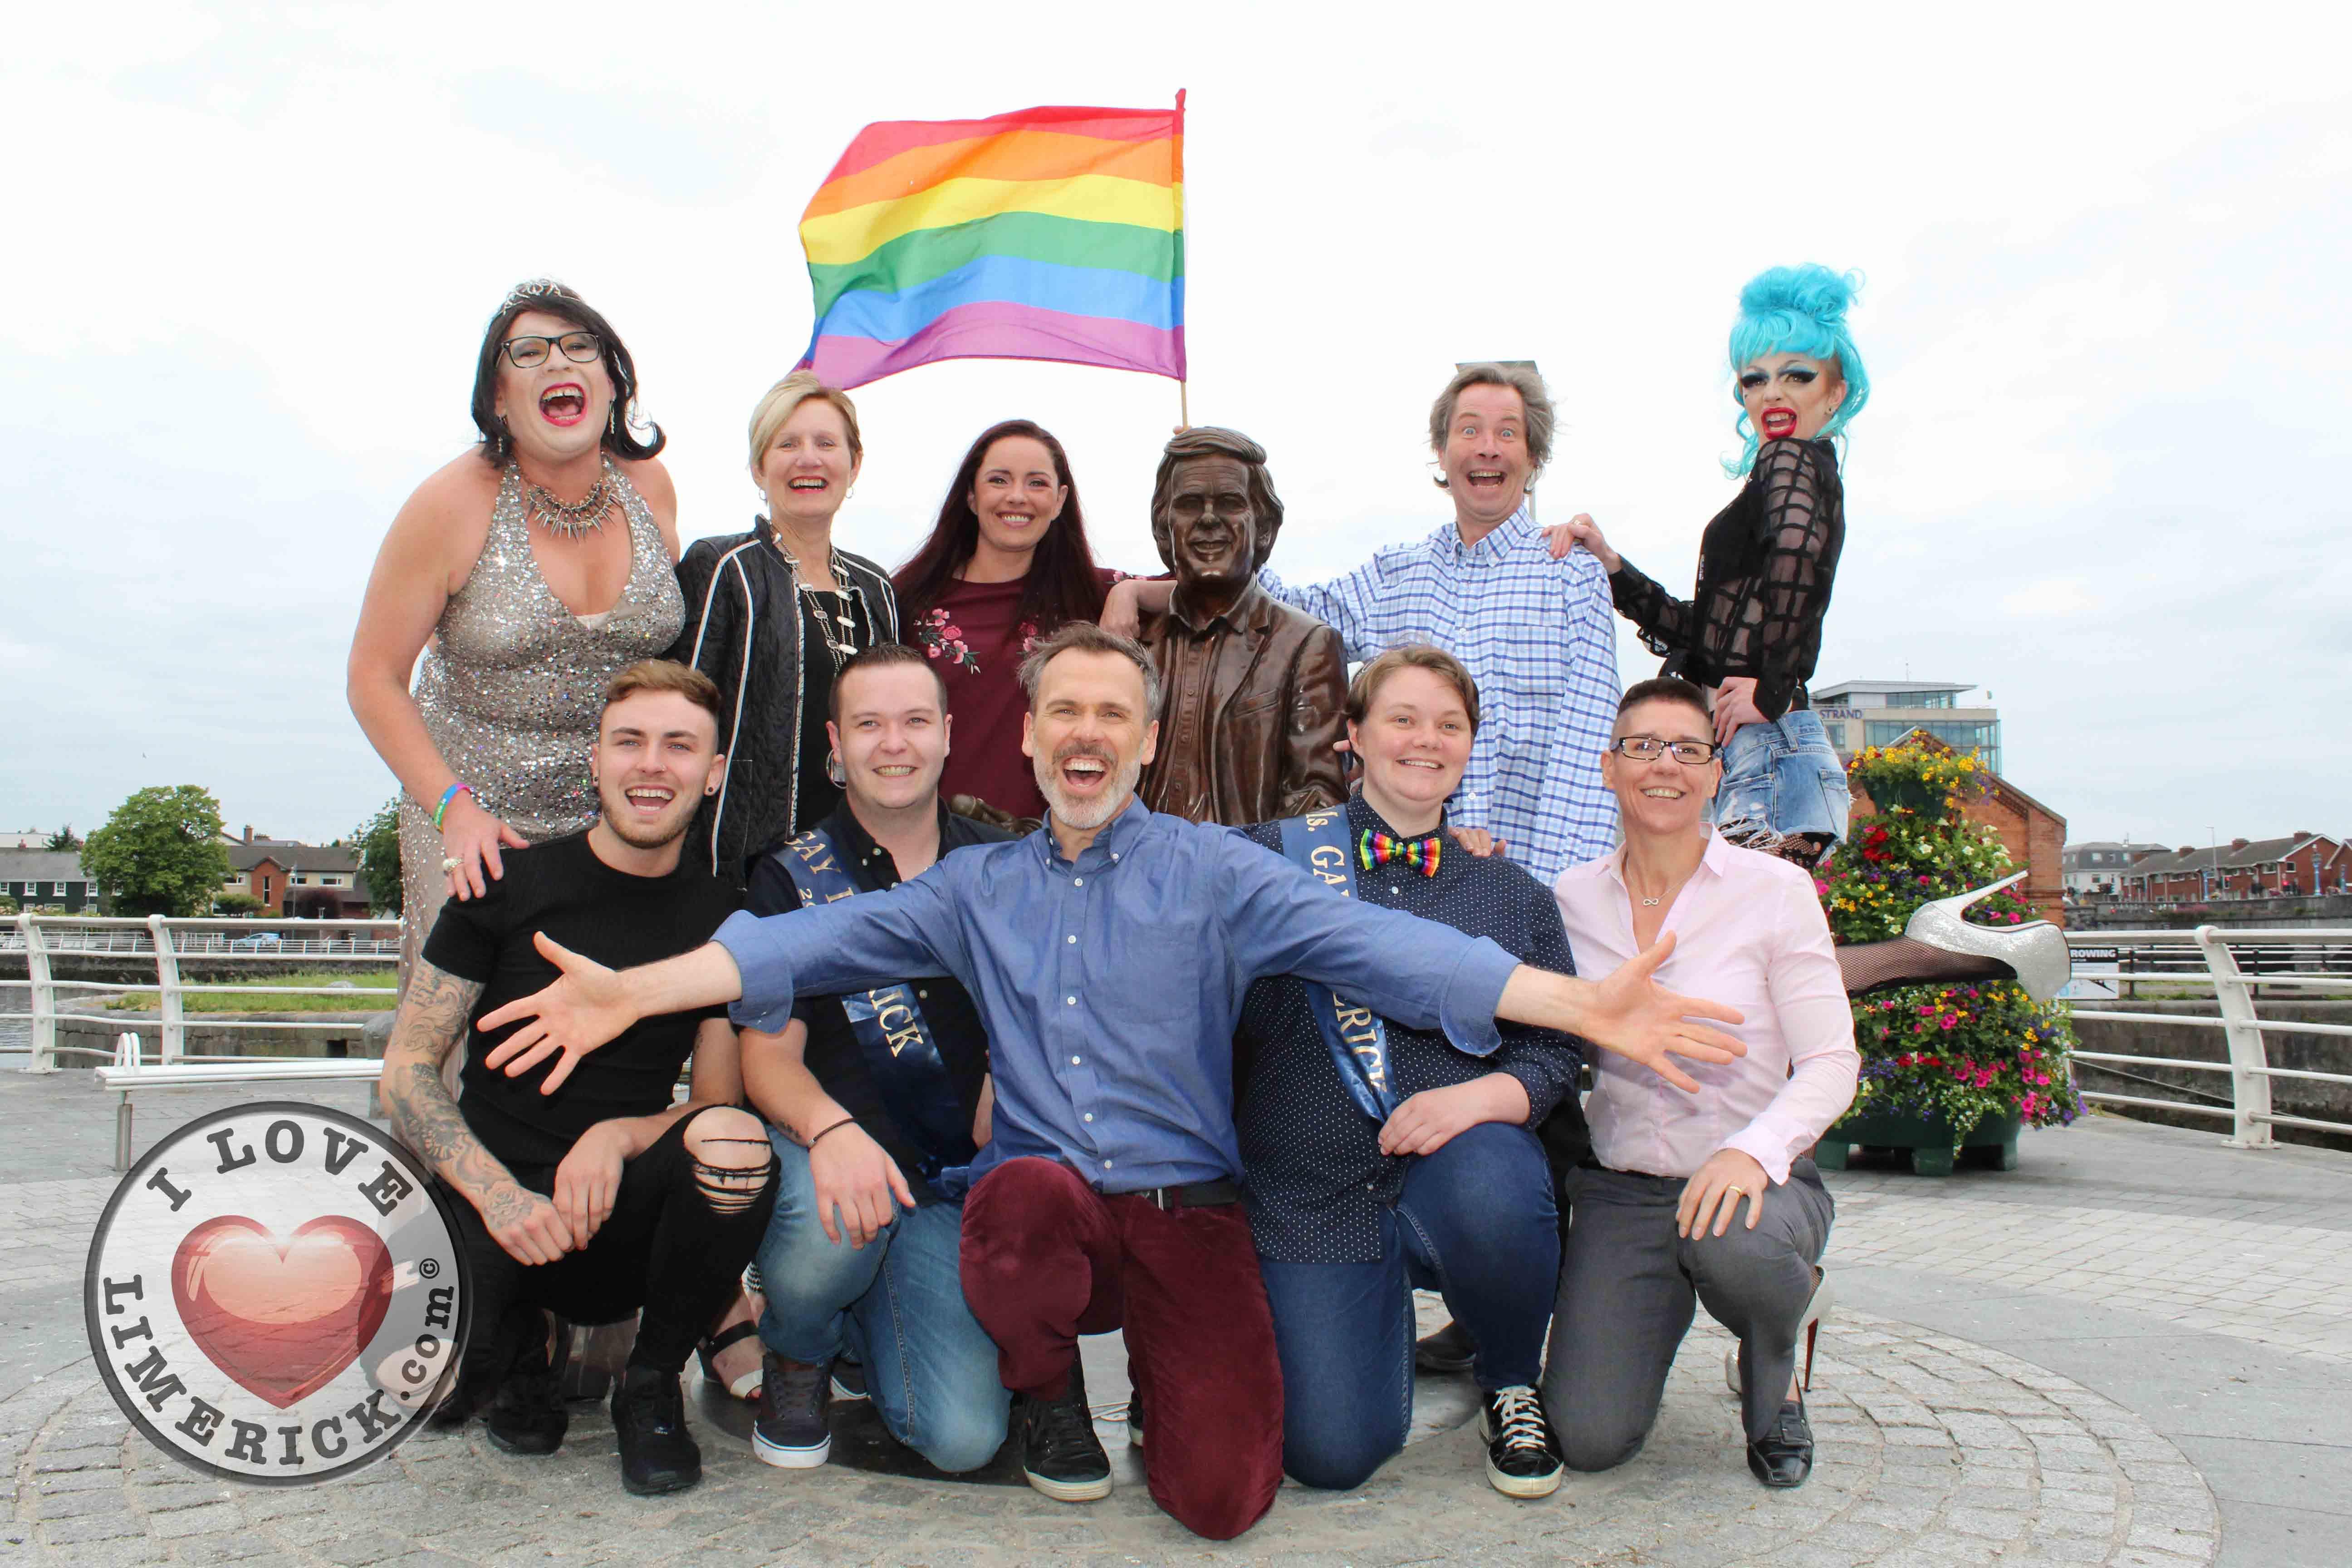 Limerick LGBTQ Pride Festival 2018